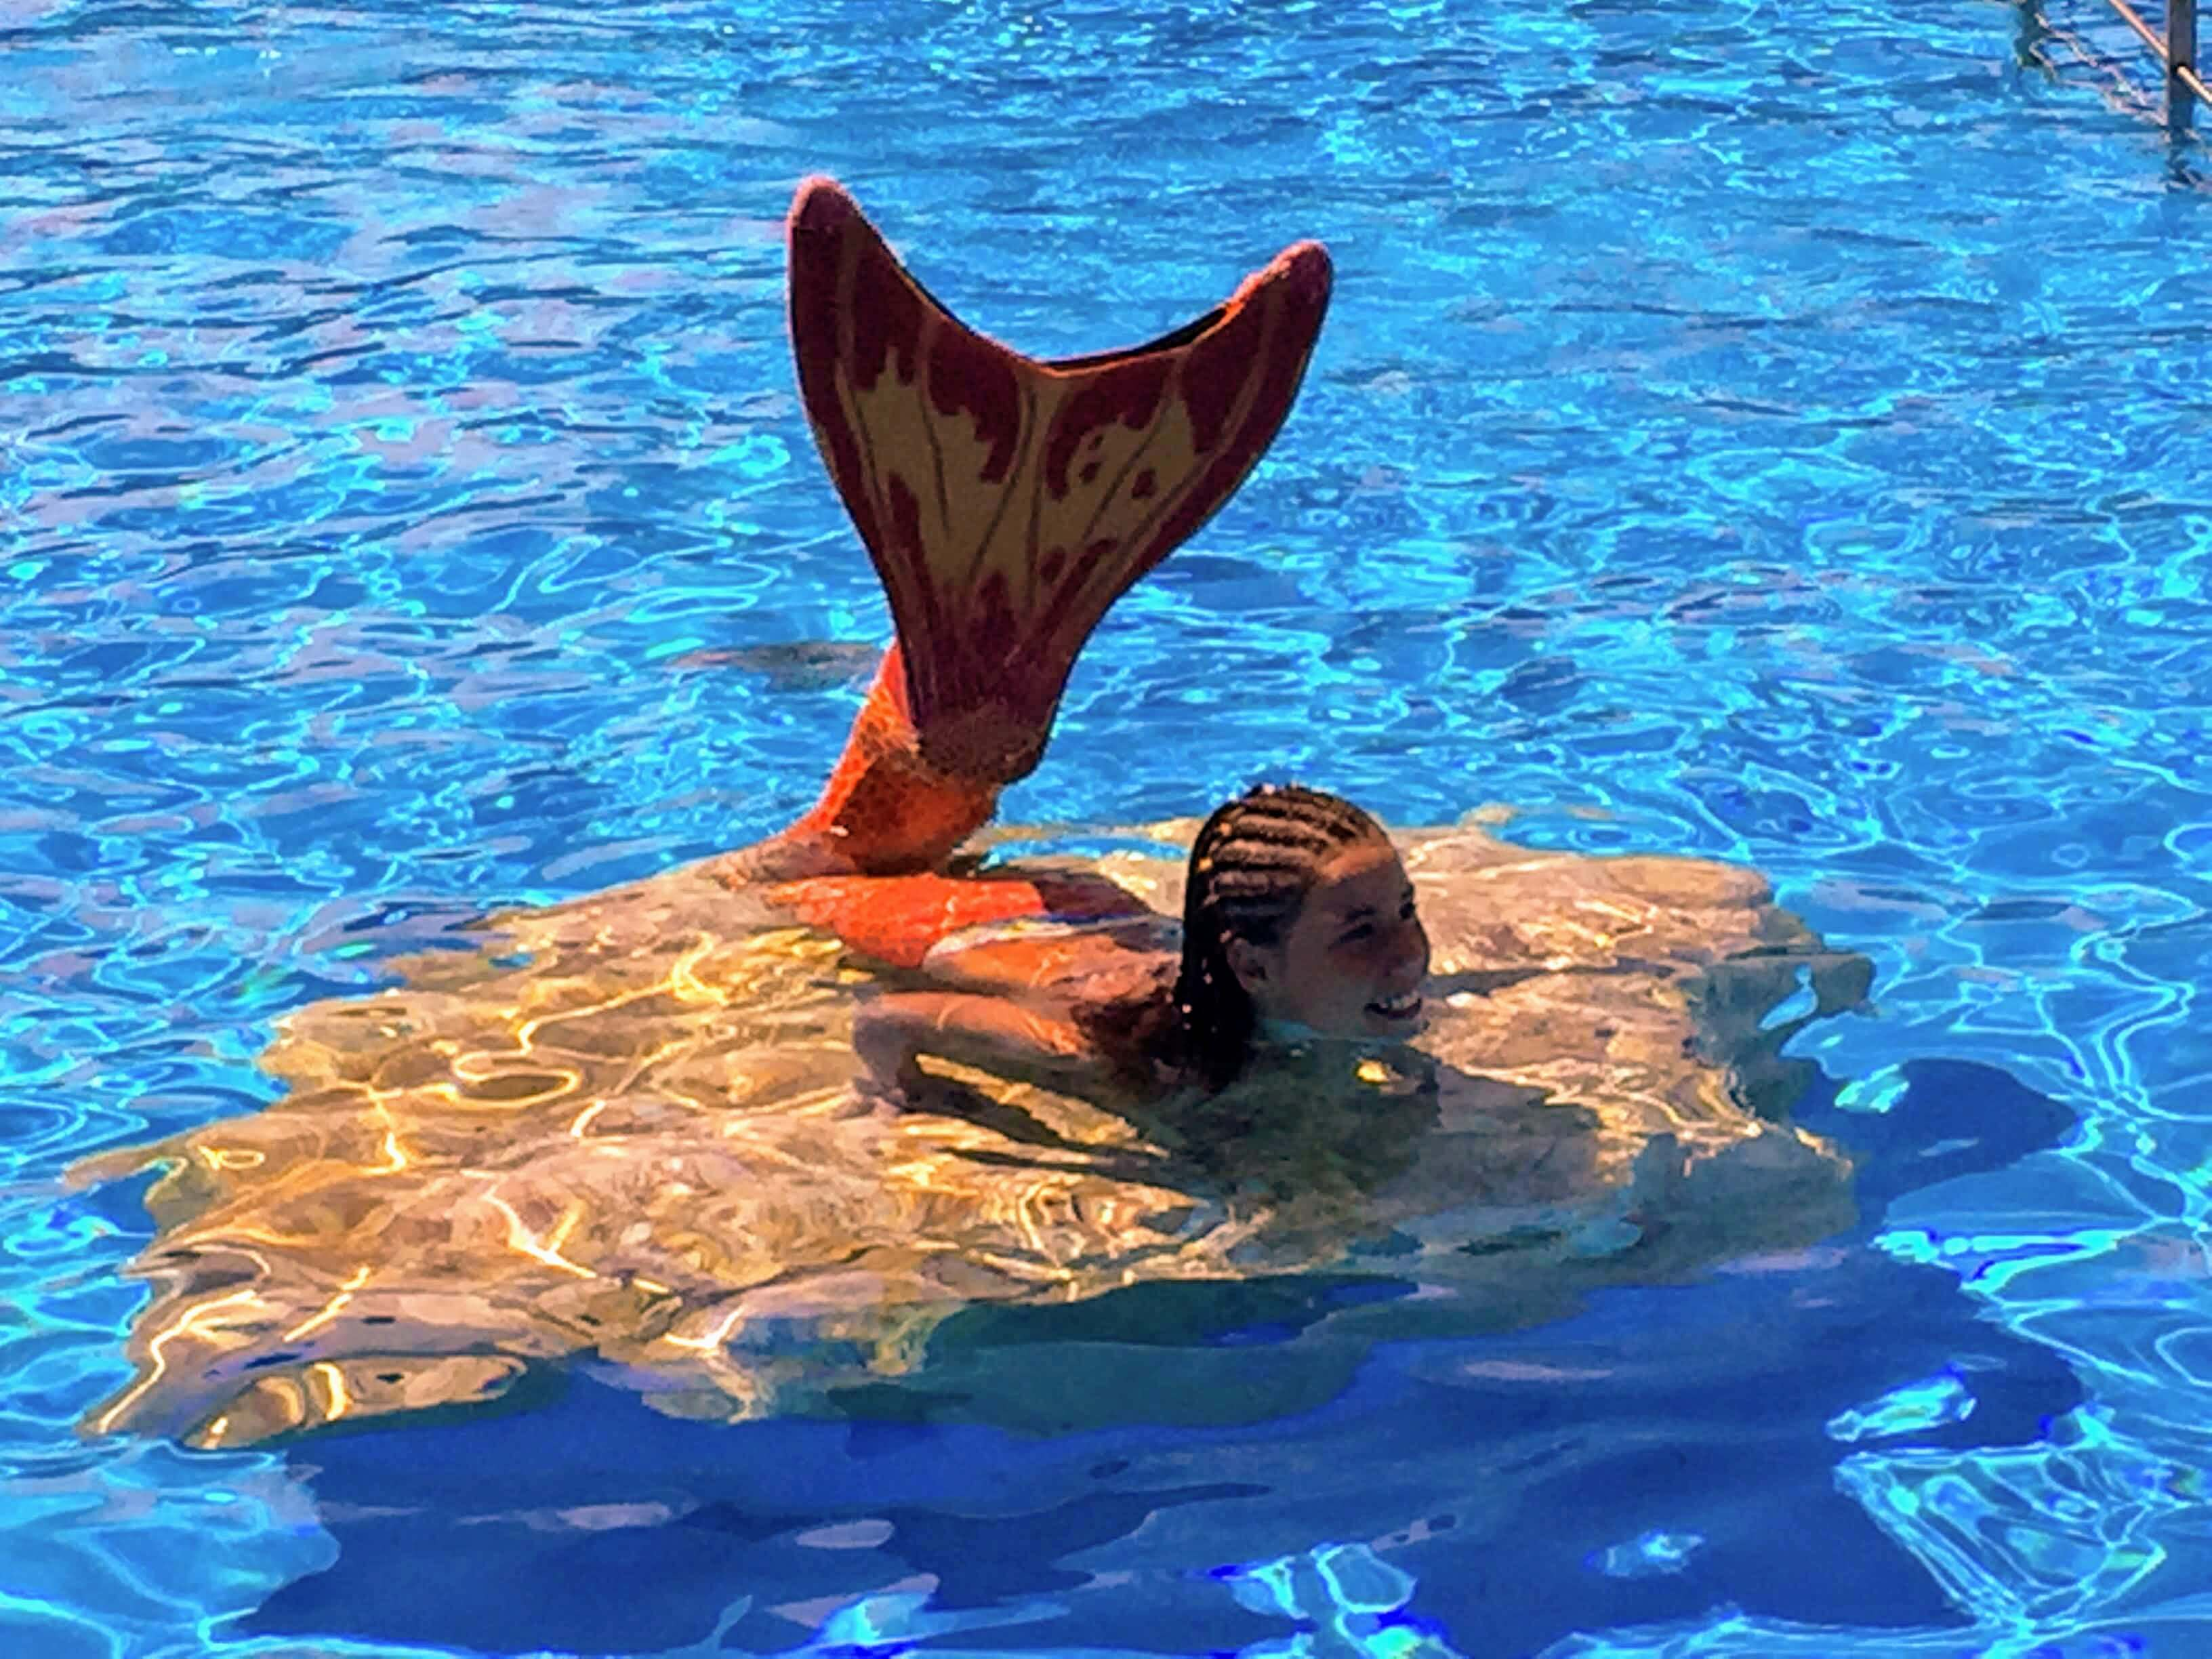 Sirena aquopolis en piscina